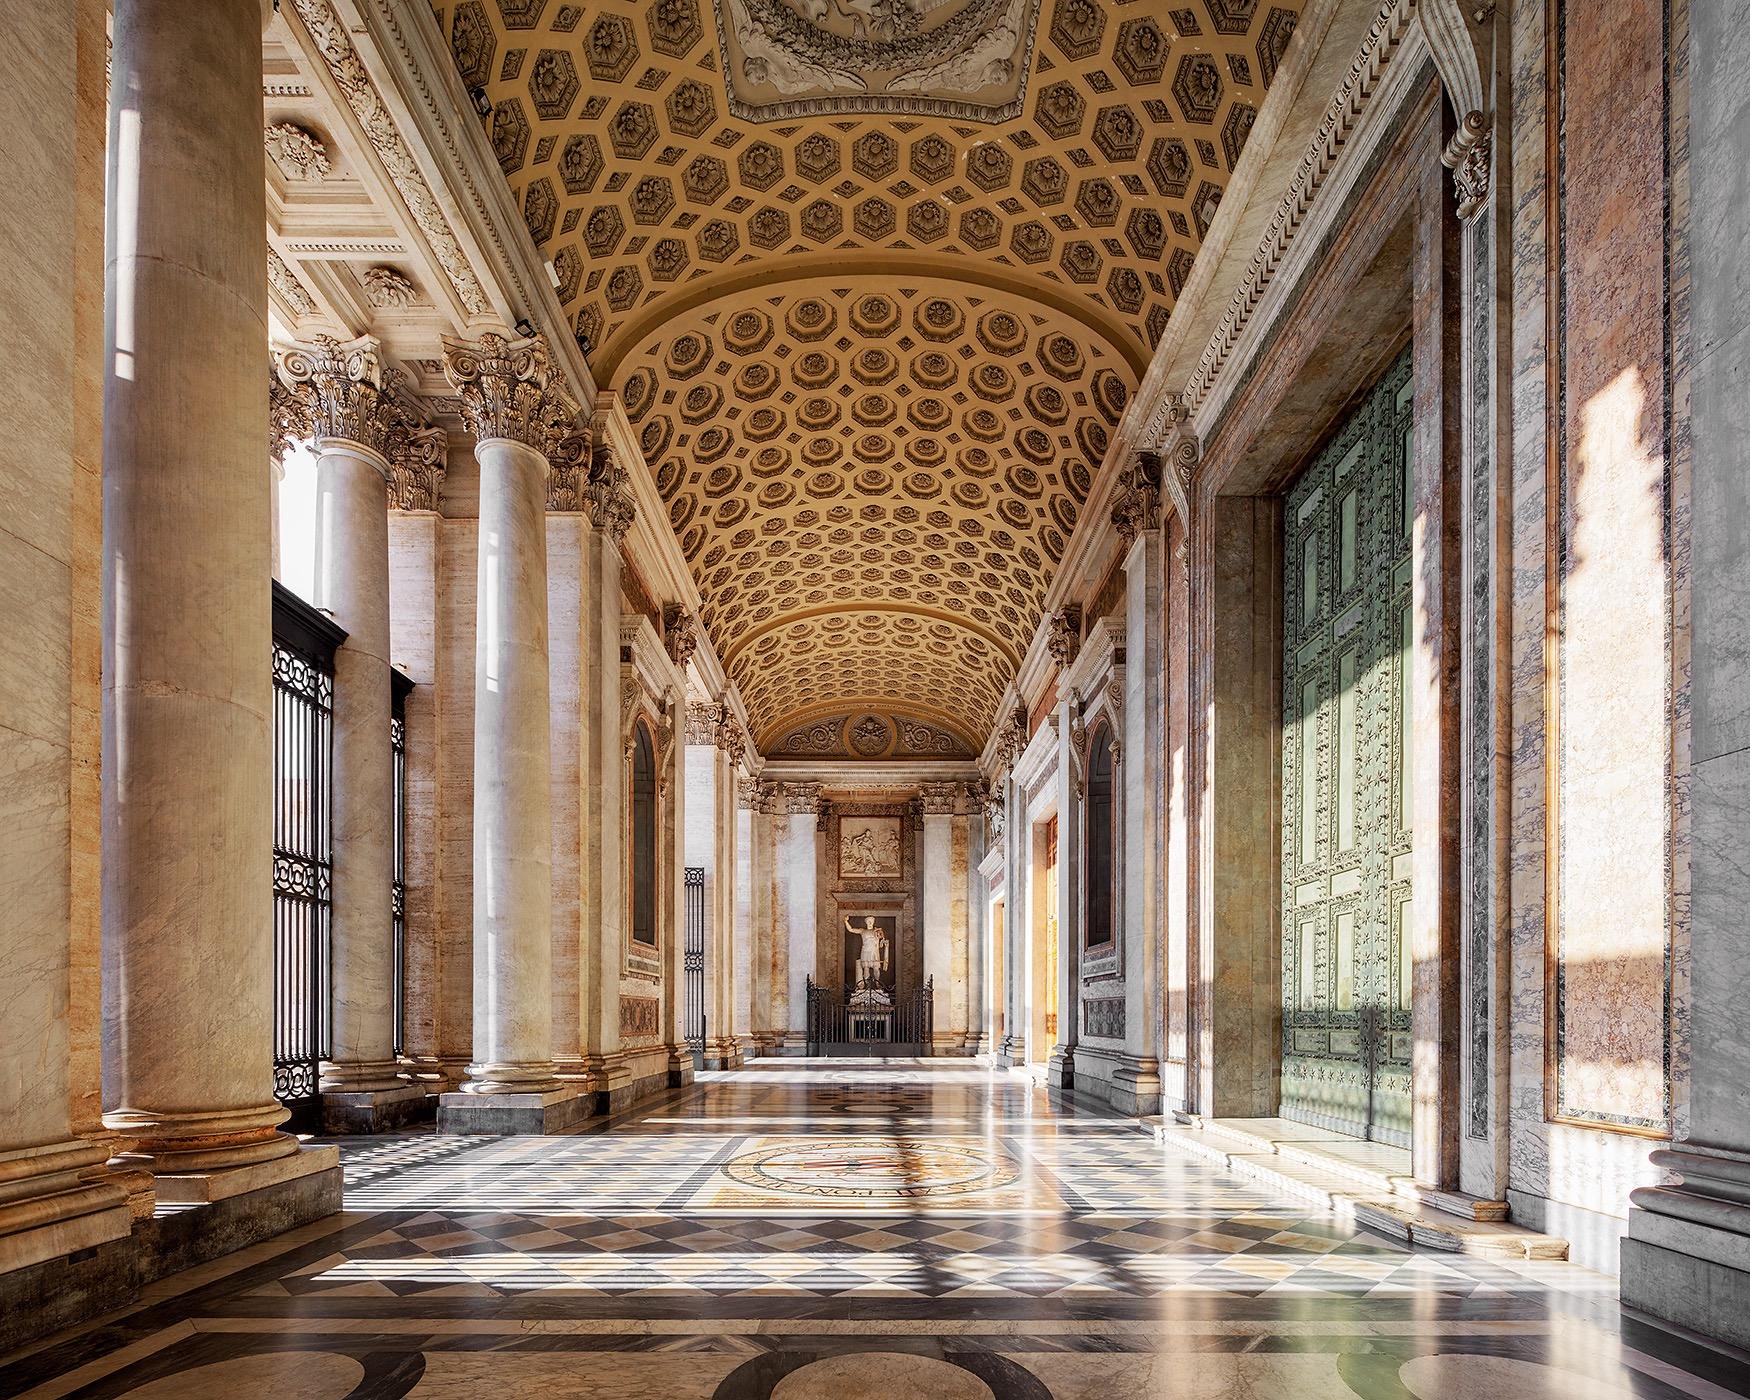 Archbasilica of Saint John Lateran Entrance